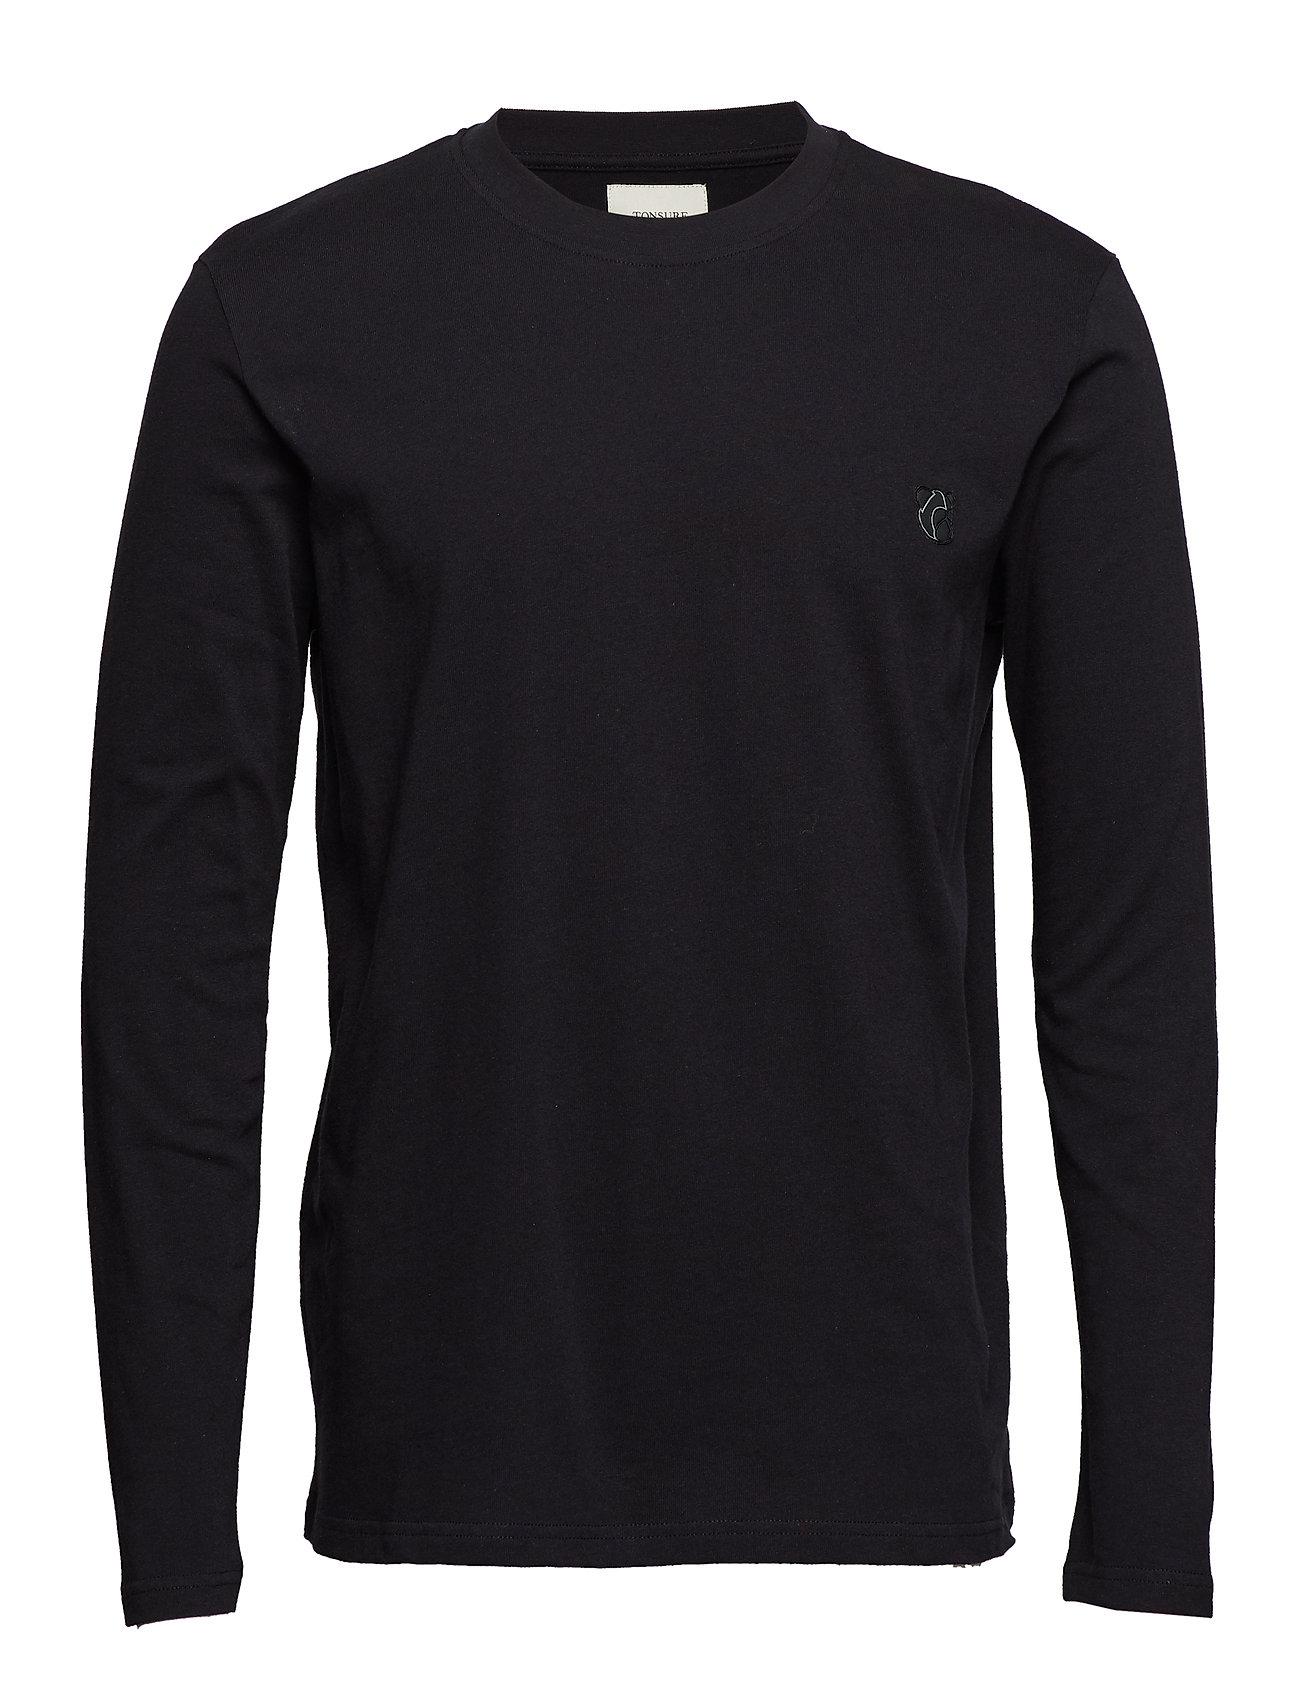 Tonsure Long sleeve jersey tee - BLACK